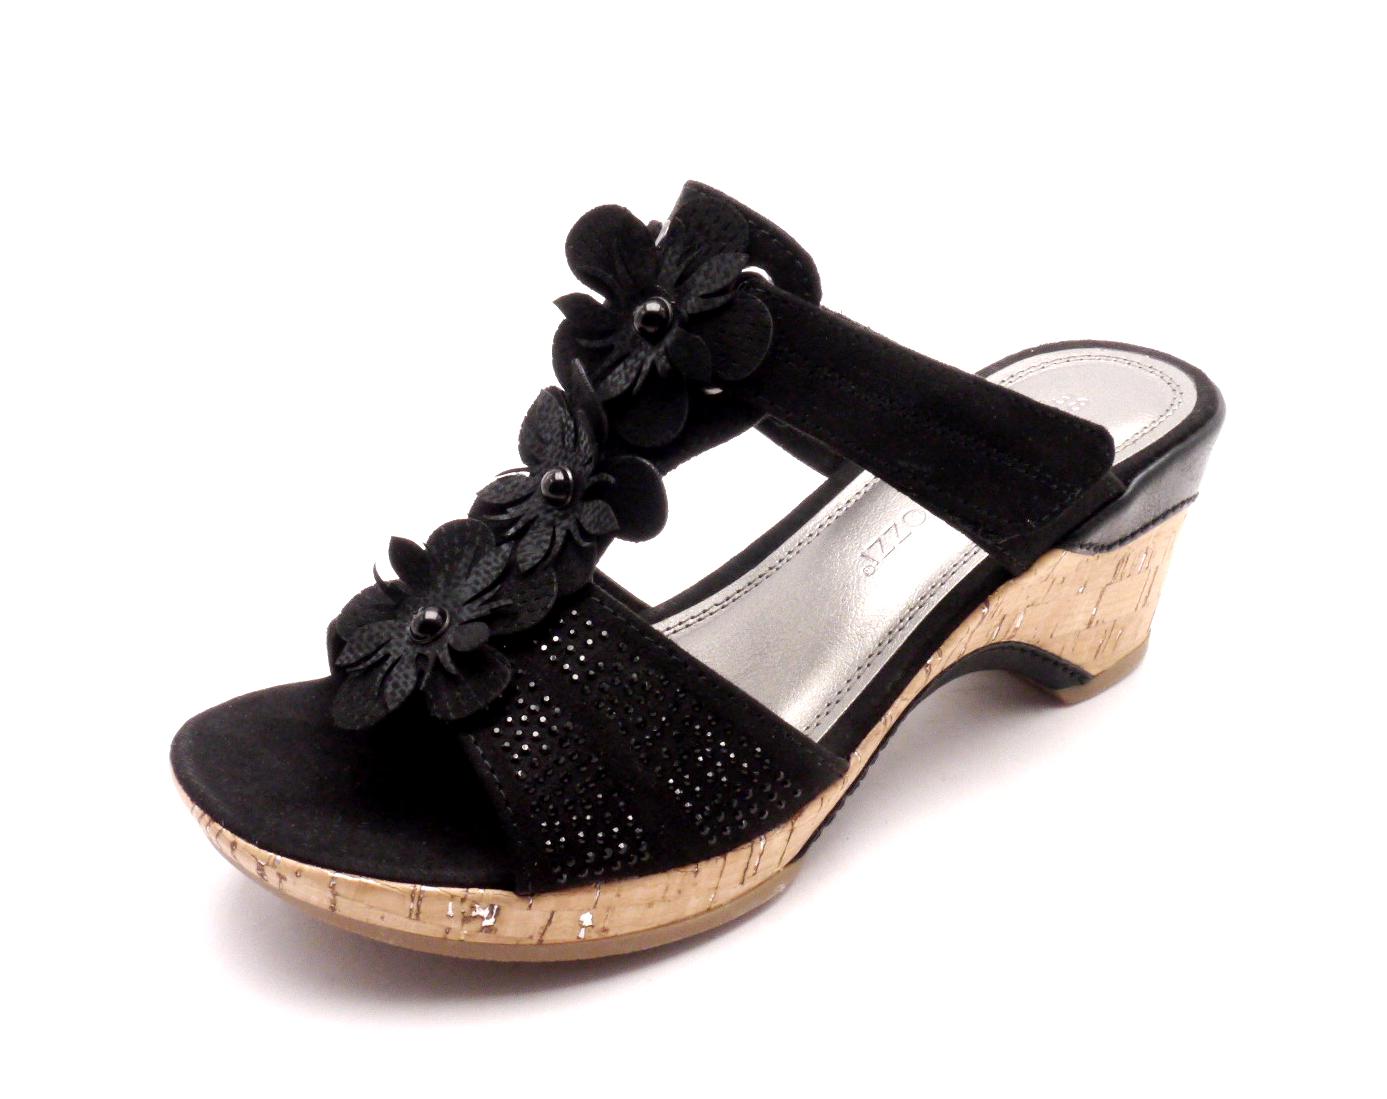 Marco Tozzi Dámské pantofle 2-27213-001 BLACK Velikost: 38